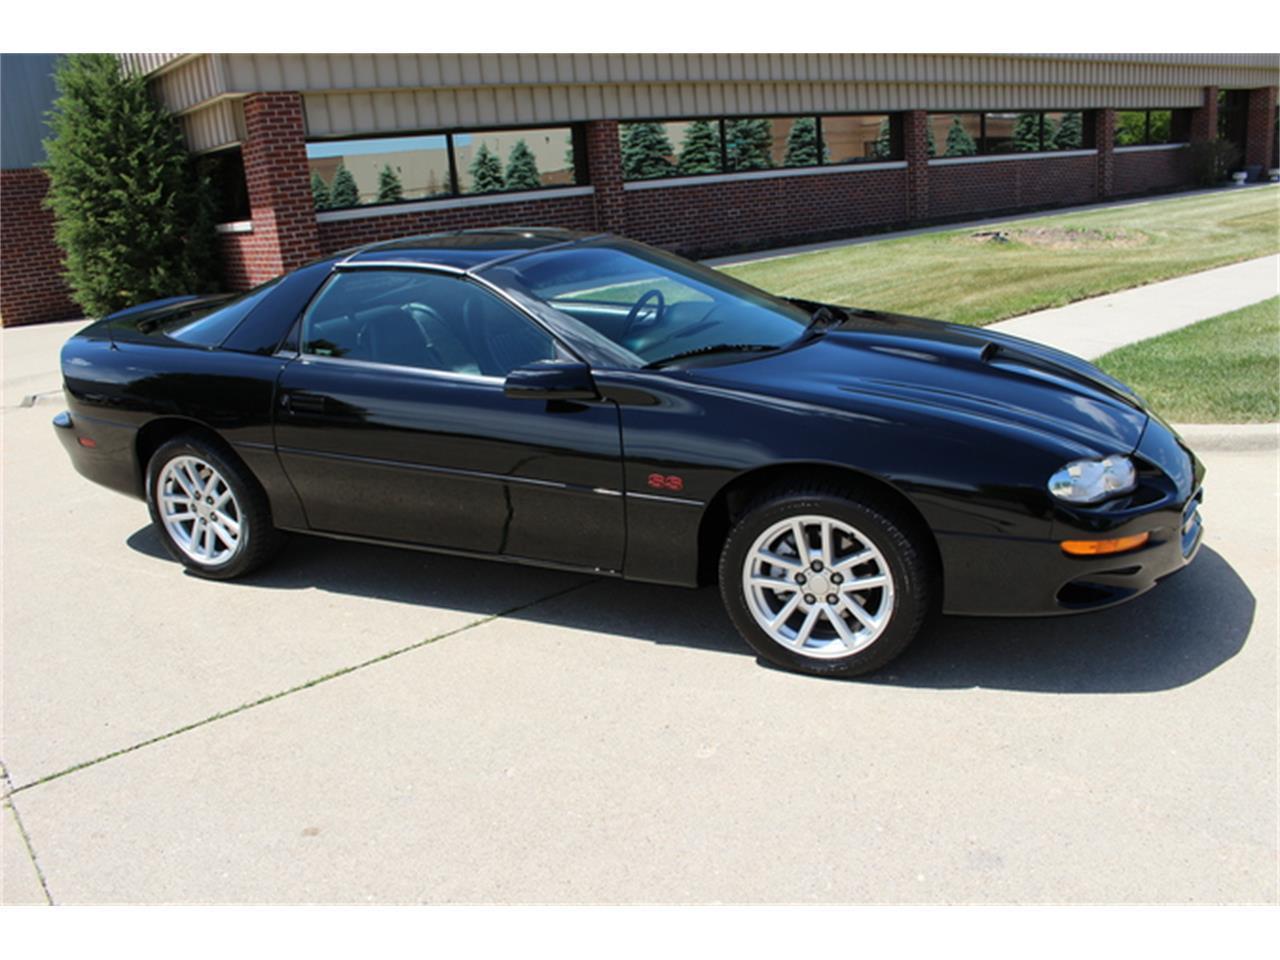 2001 Chevrolet Camaro (CC-1319483) for sale in Macomb, Michigan